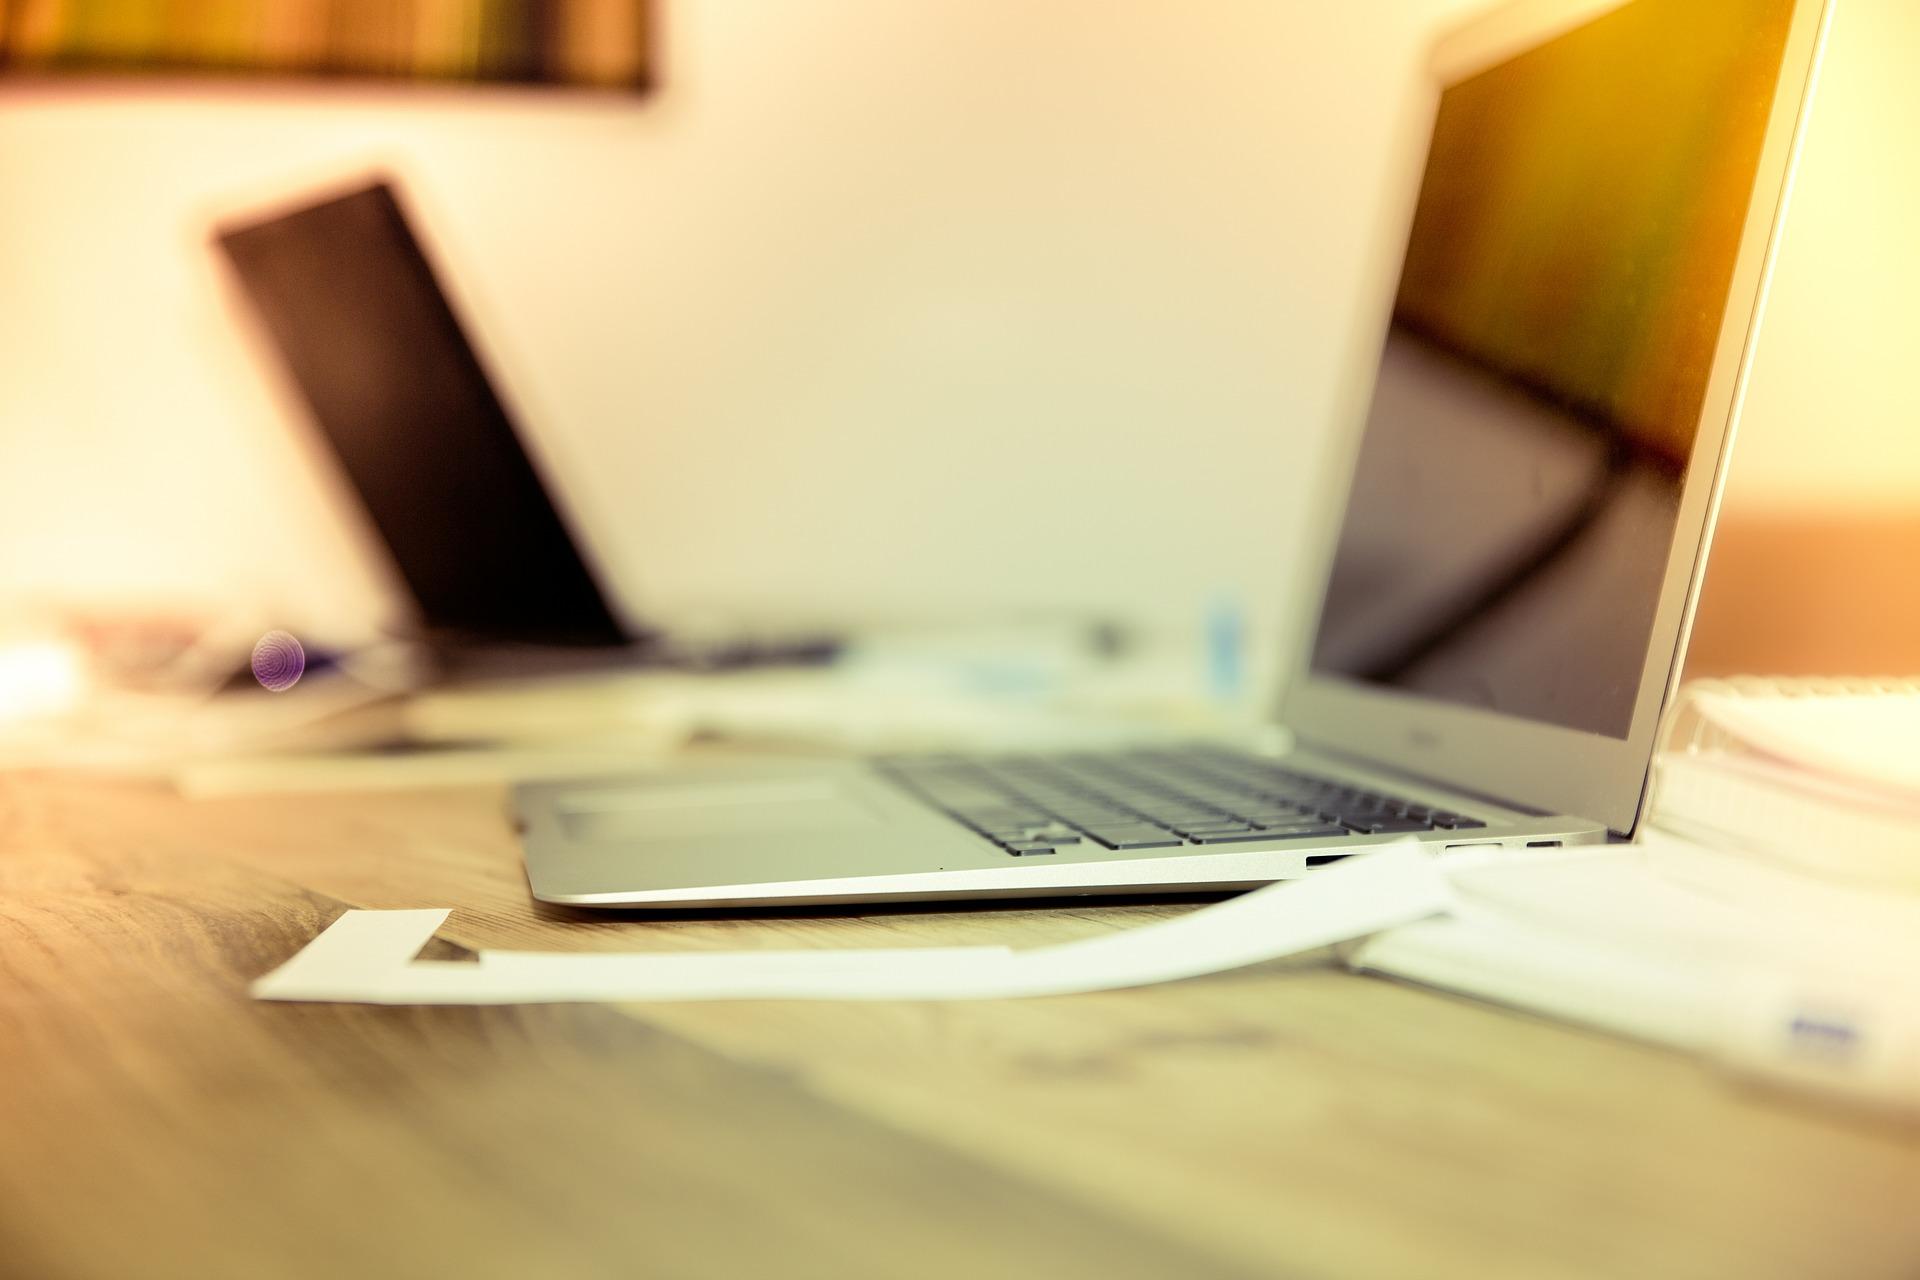 Tutoriel : Rediriger une adresse email OVH vers Gmail